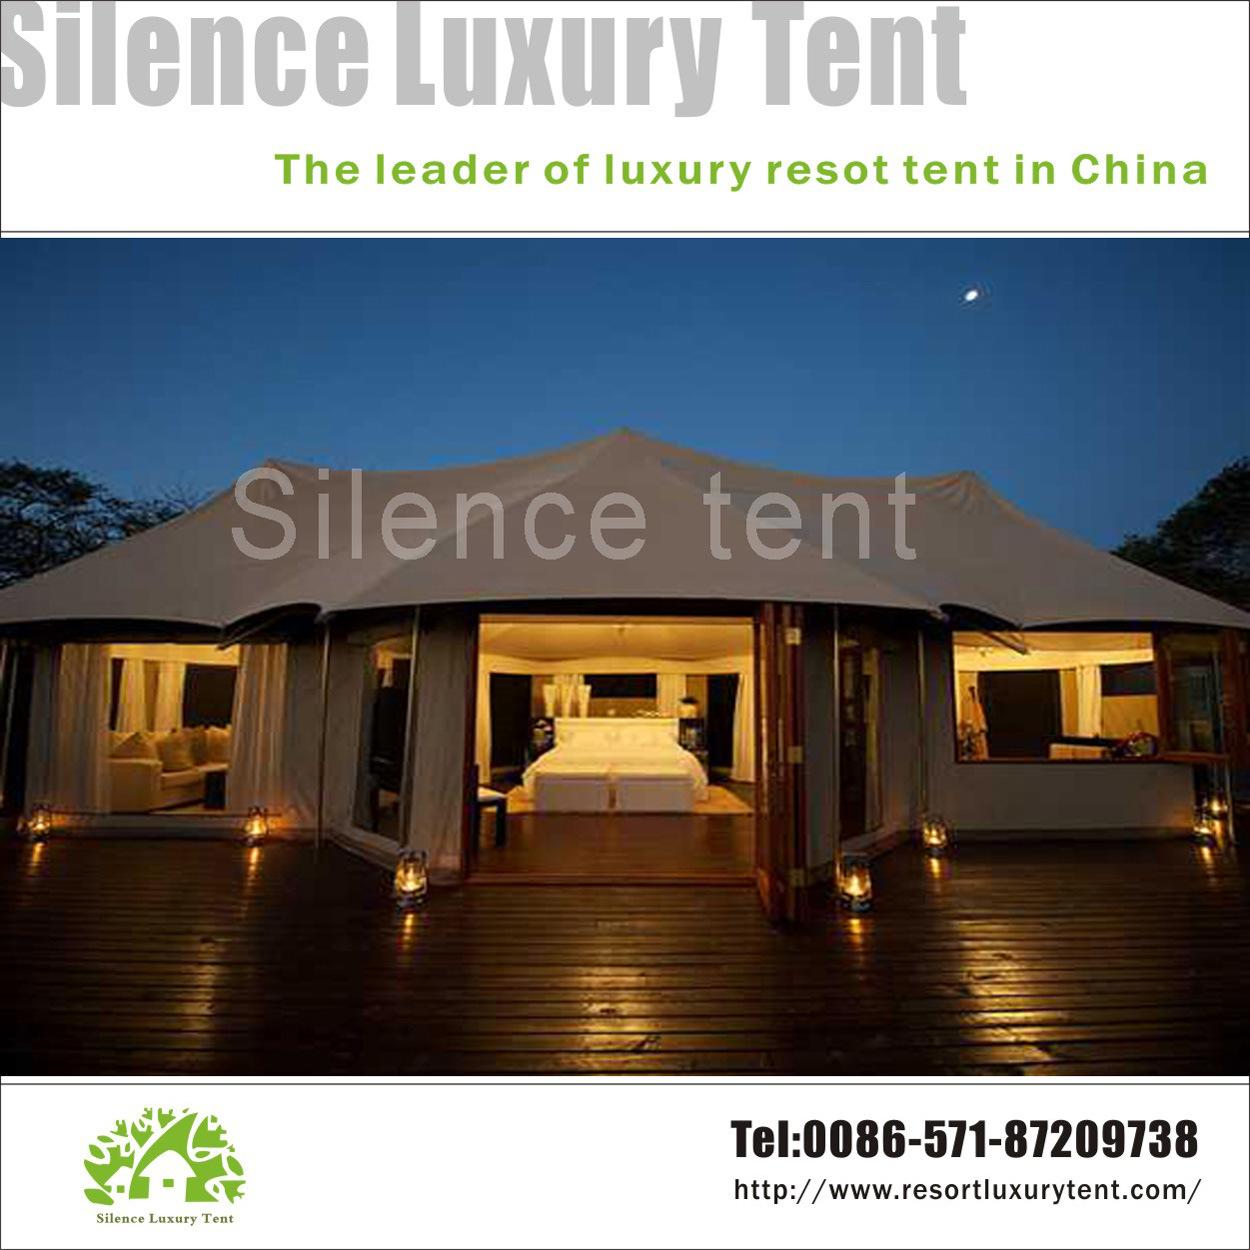 Luxury Resort Tent - Hangzhou Deyi Tent Manufacture Co. Ltd. - page 1. & Luxury Resort Tent - Hangzhou Deyi Tent Manufacture Co. Ltd ...